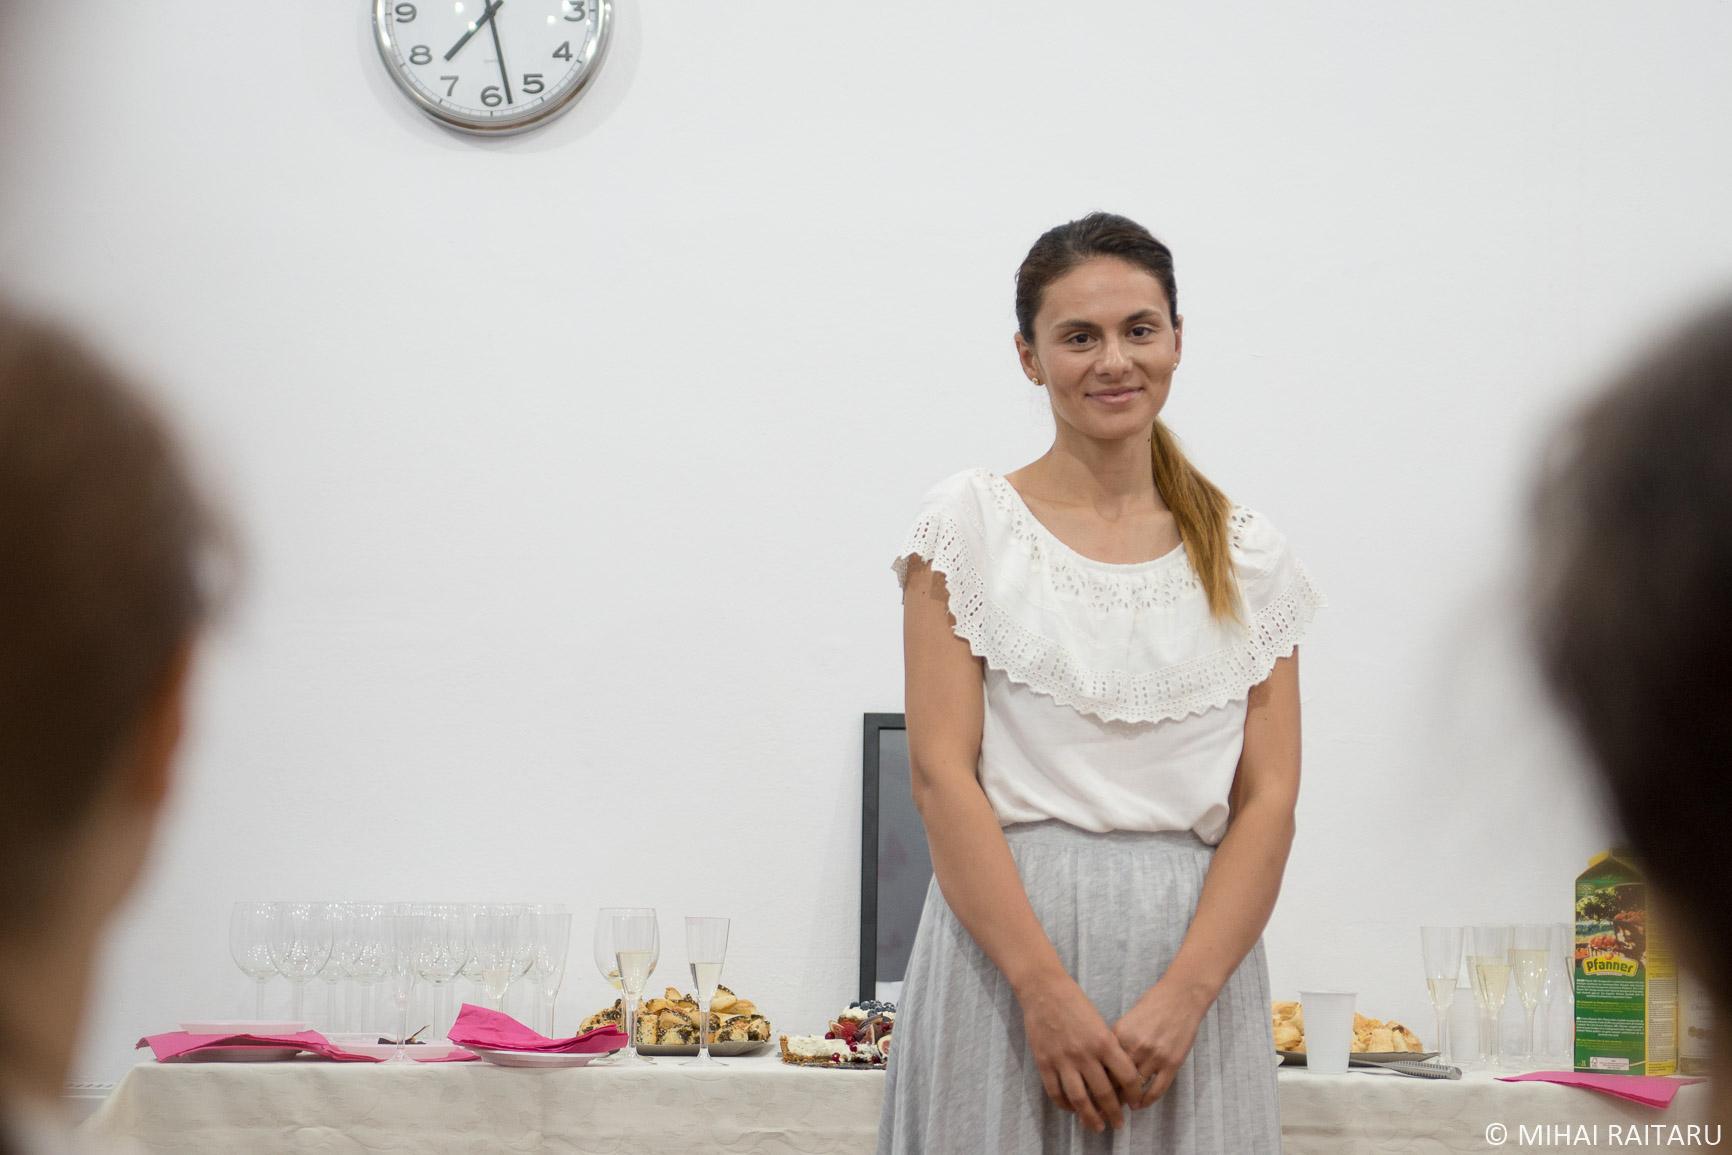 Lectie-de-Actorie-Ioana-Ginghina-fotografie-Mihai-Raitaru-septembrie-2017 (46)